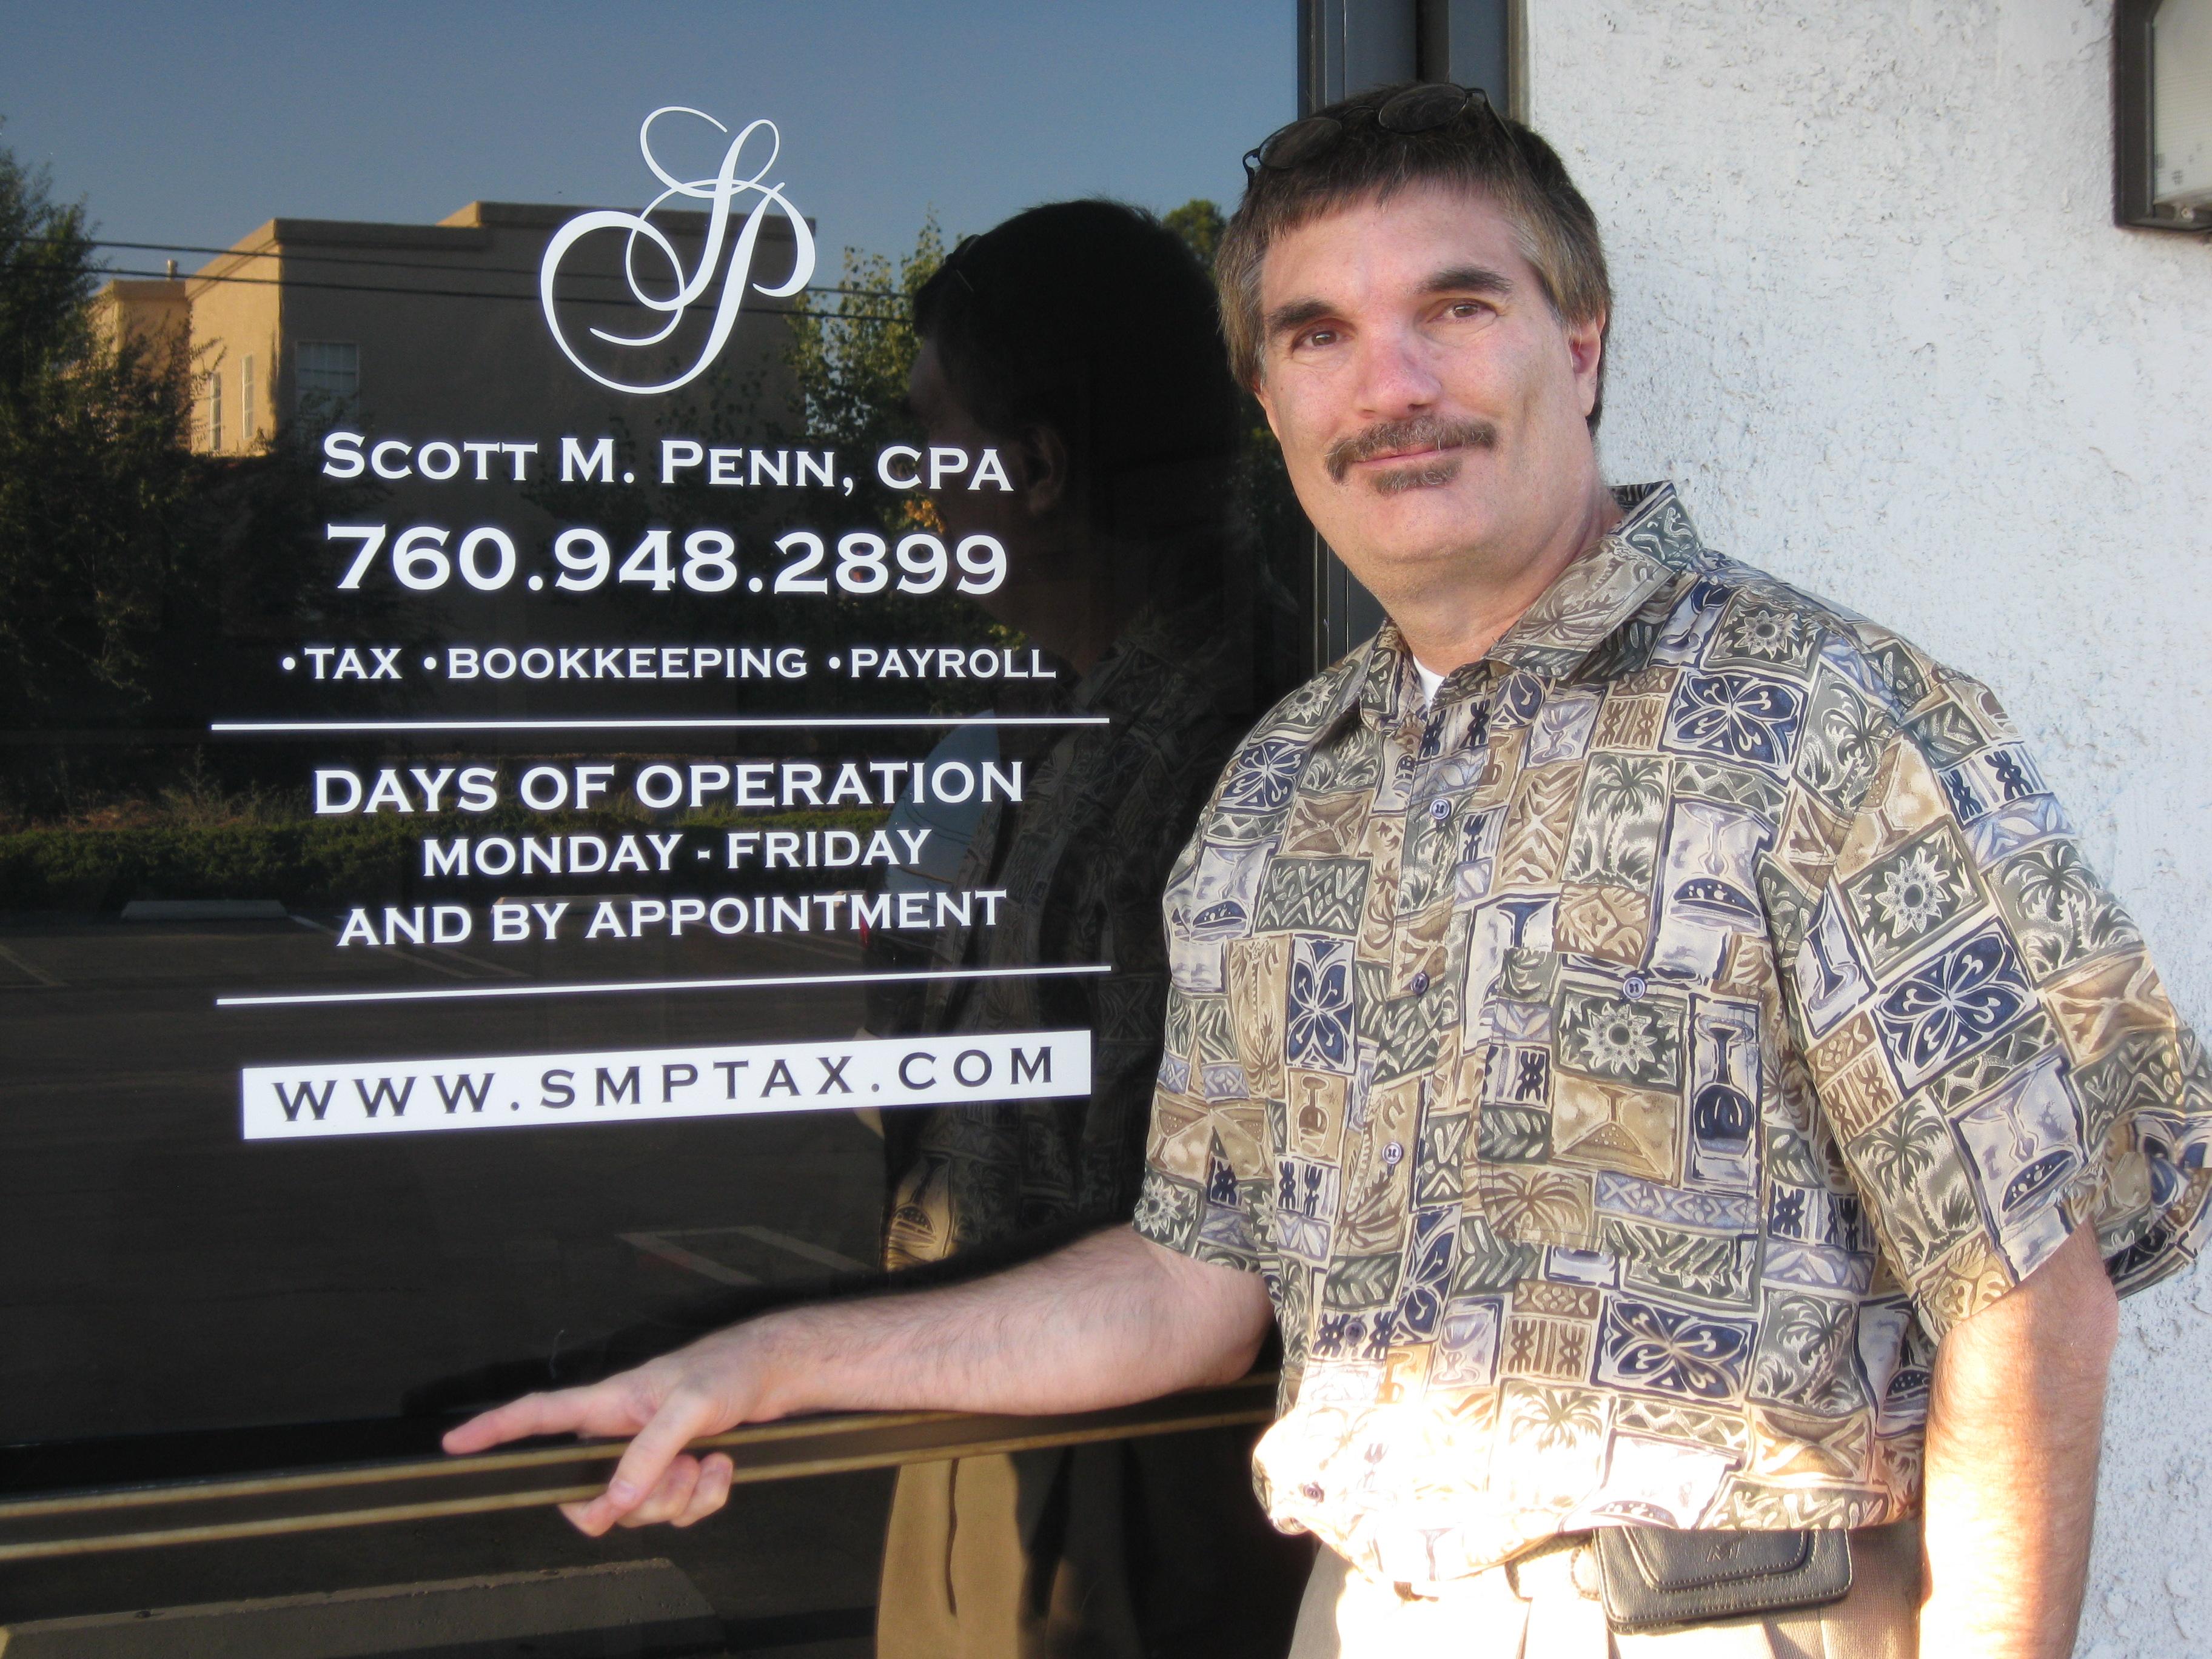 Scott M. Penn, CPA, PC - Tax Preparation & Tax Relief Services - ad image